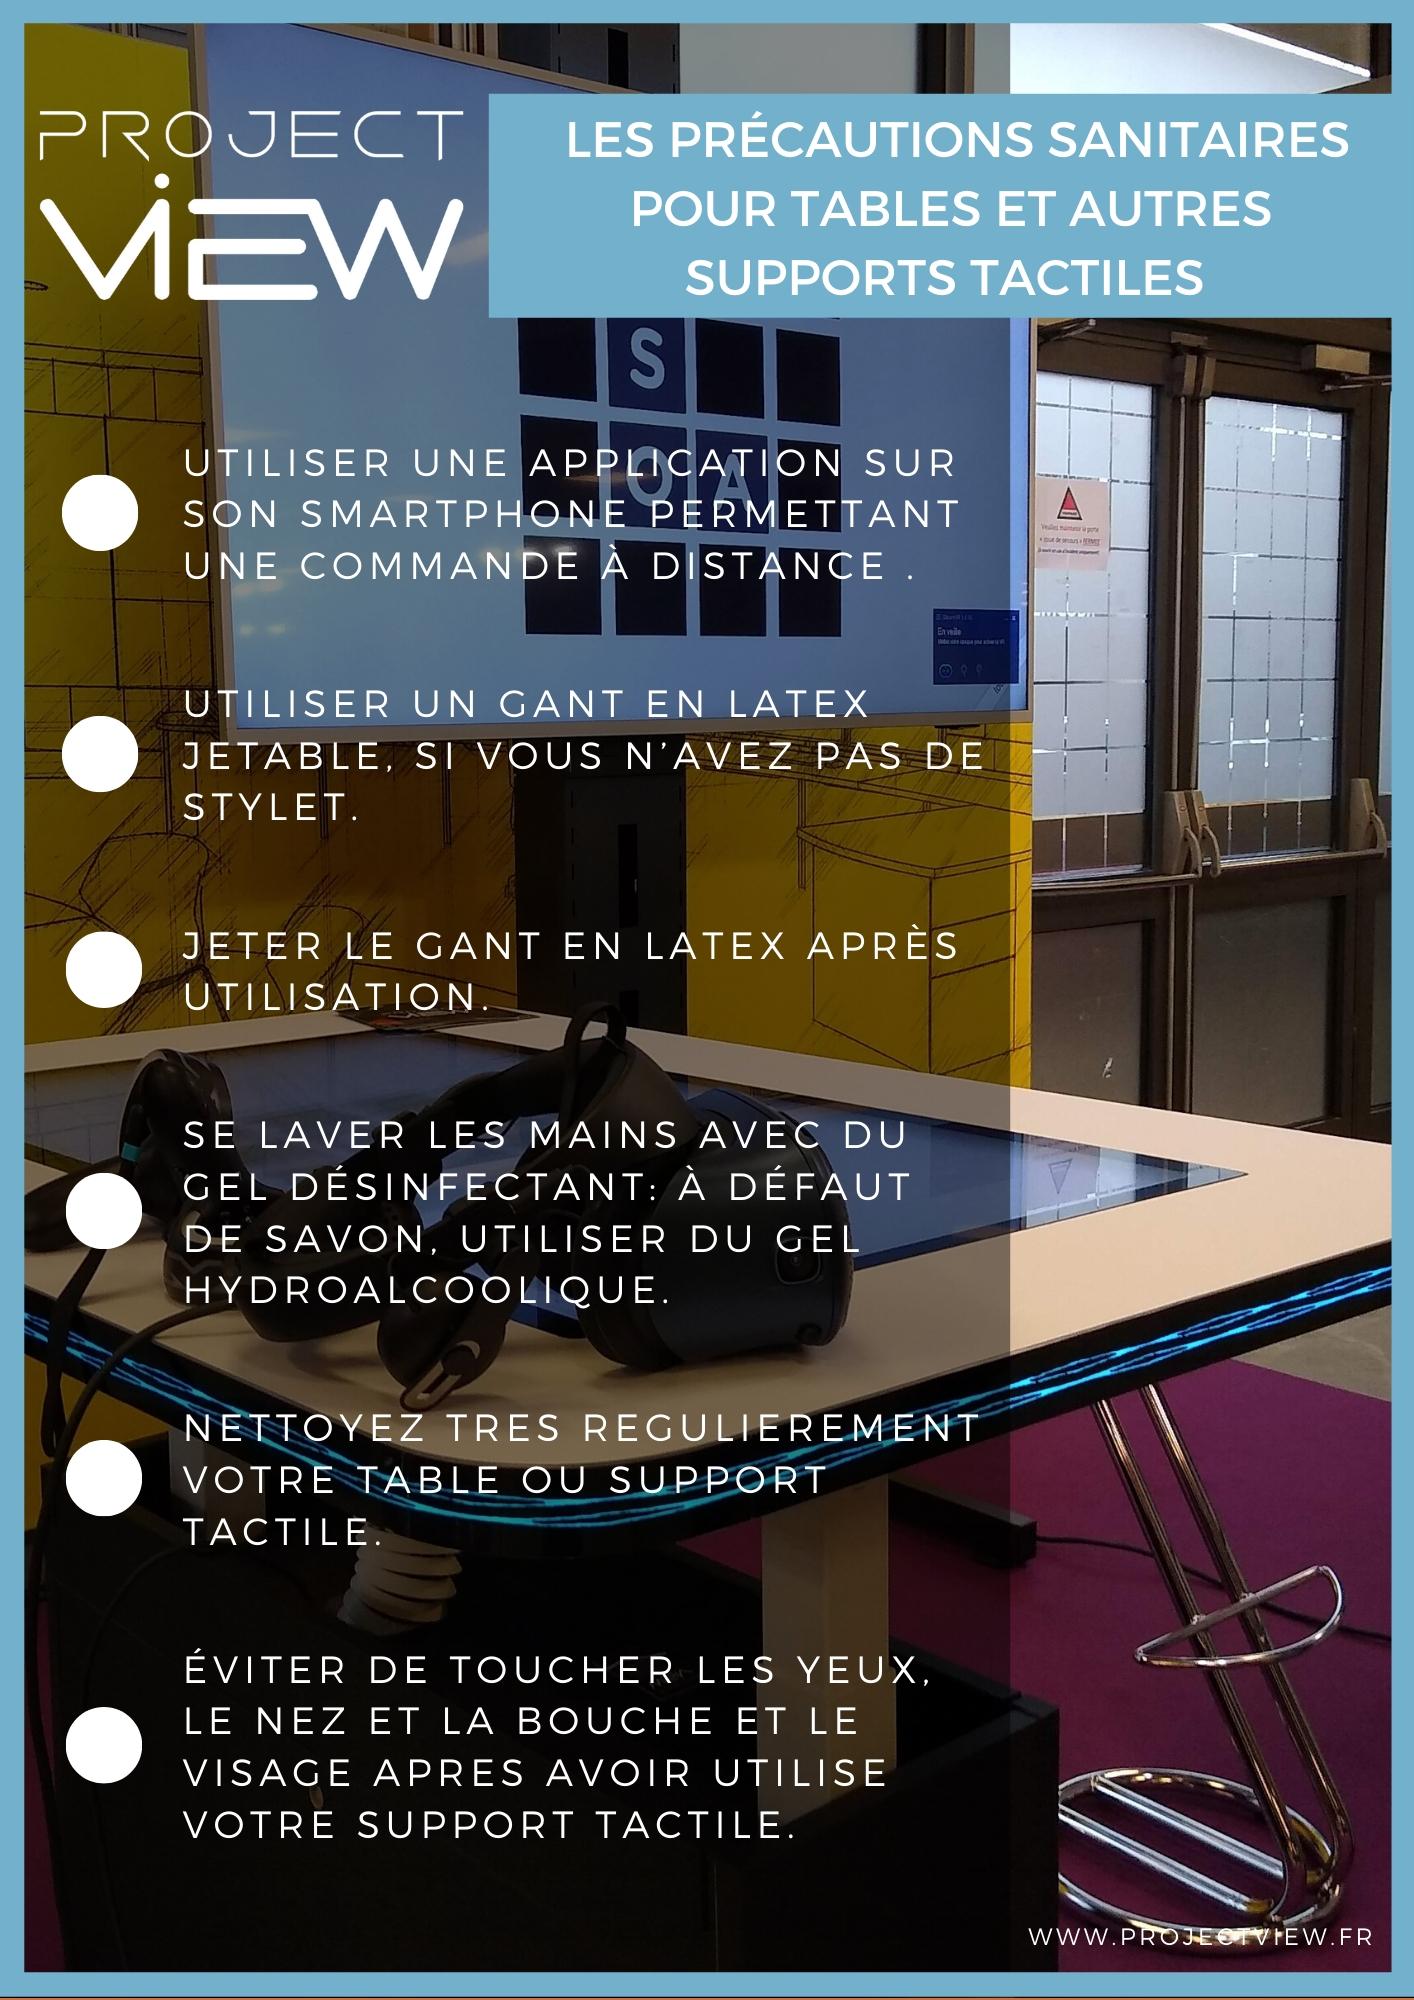 Checklist des gestes barrières COVID19 3